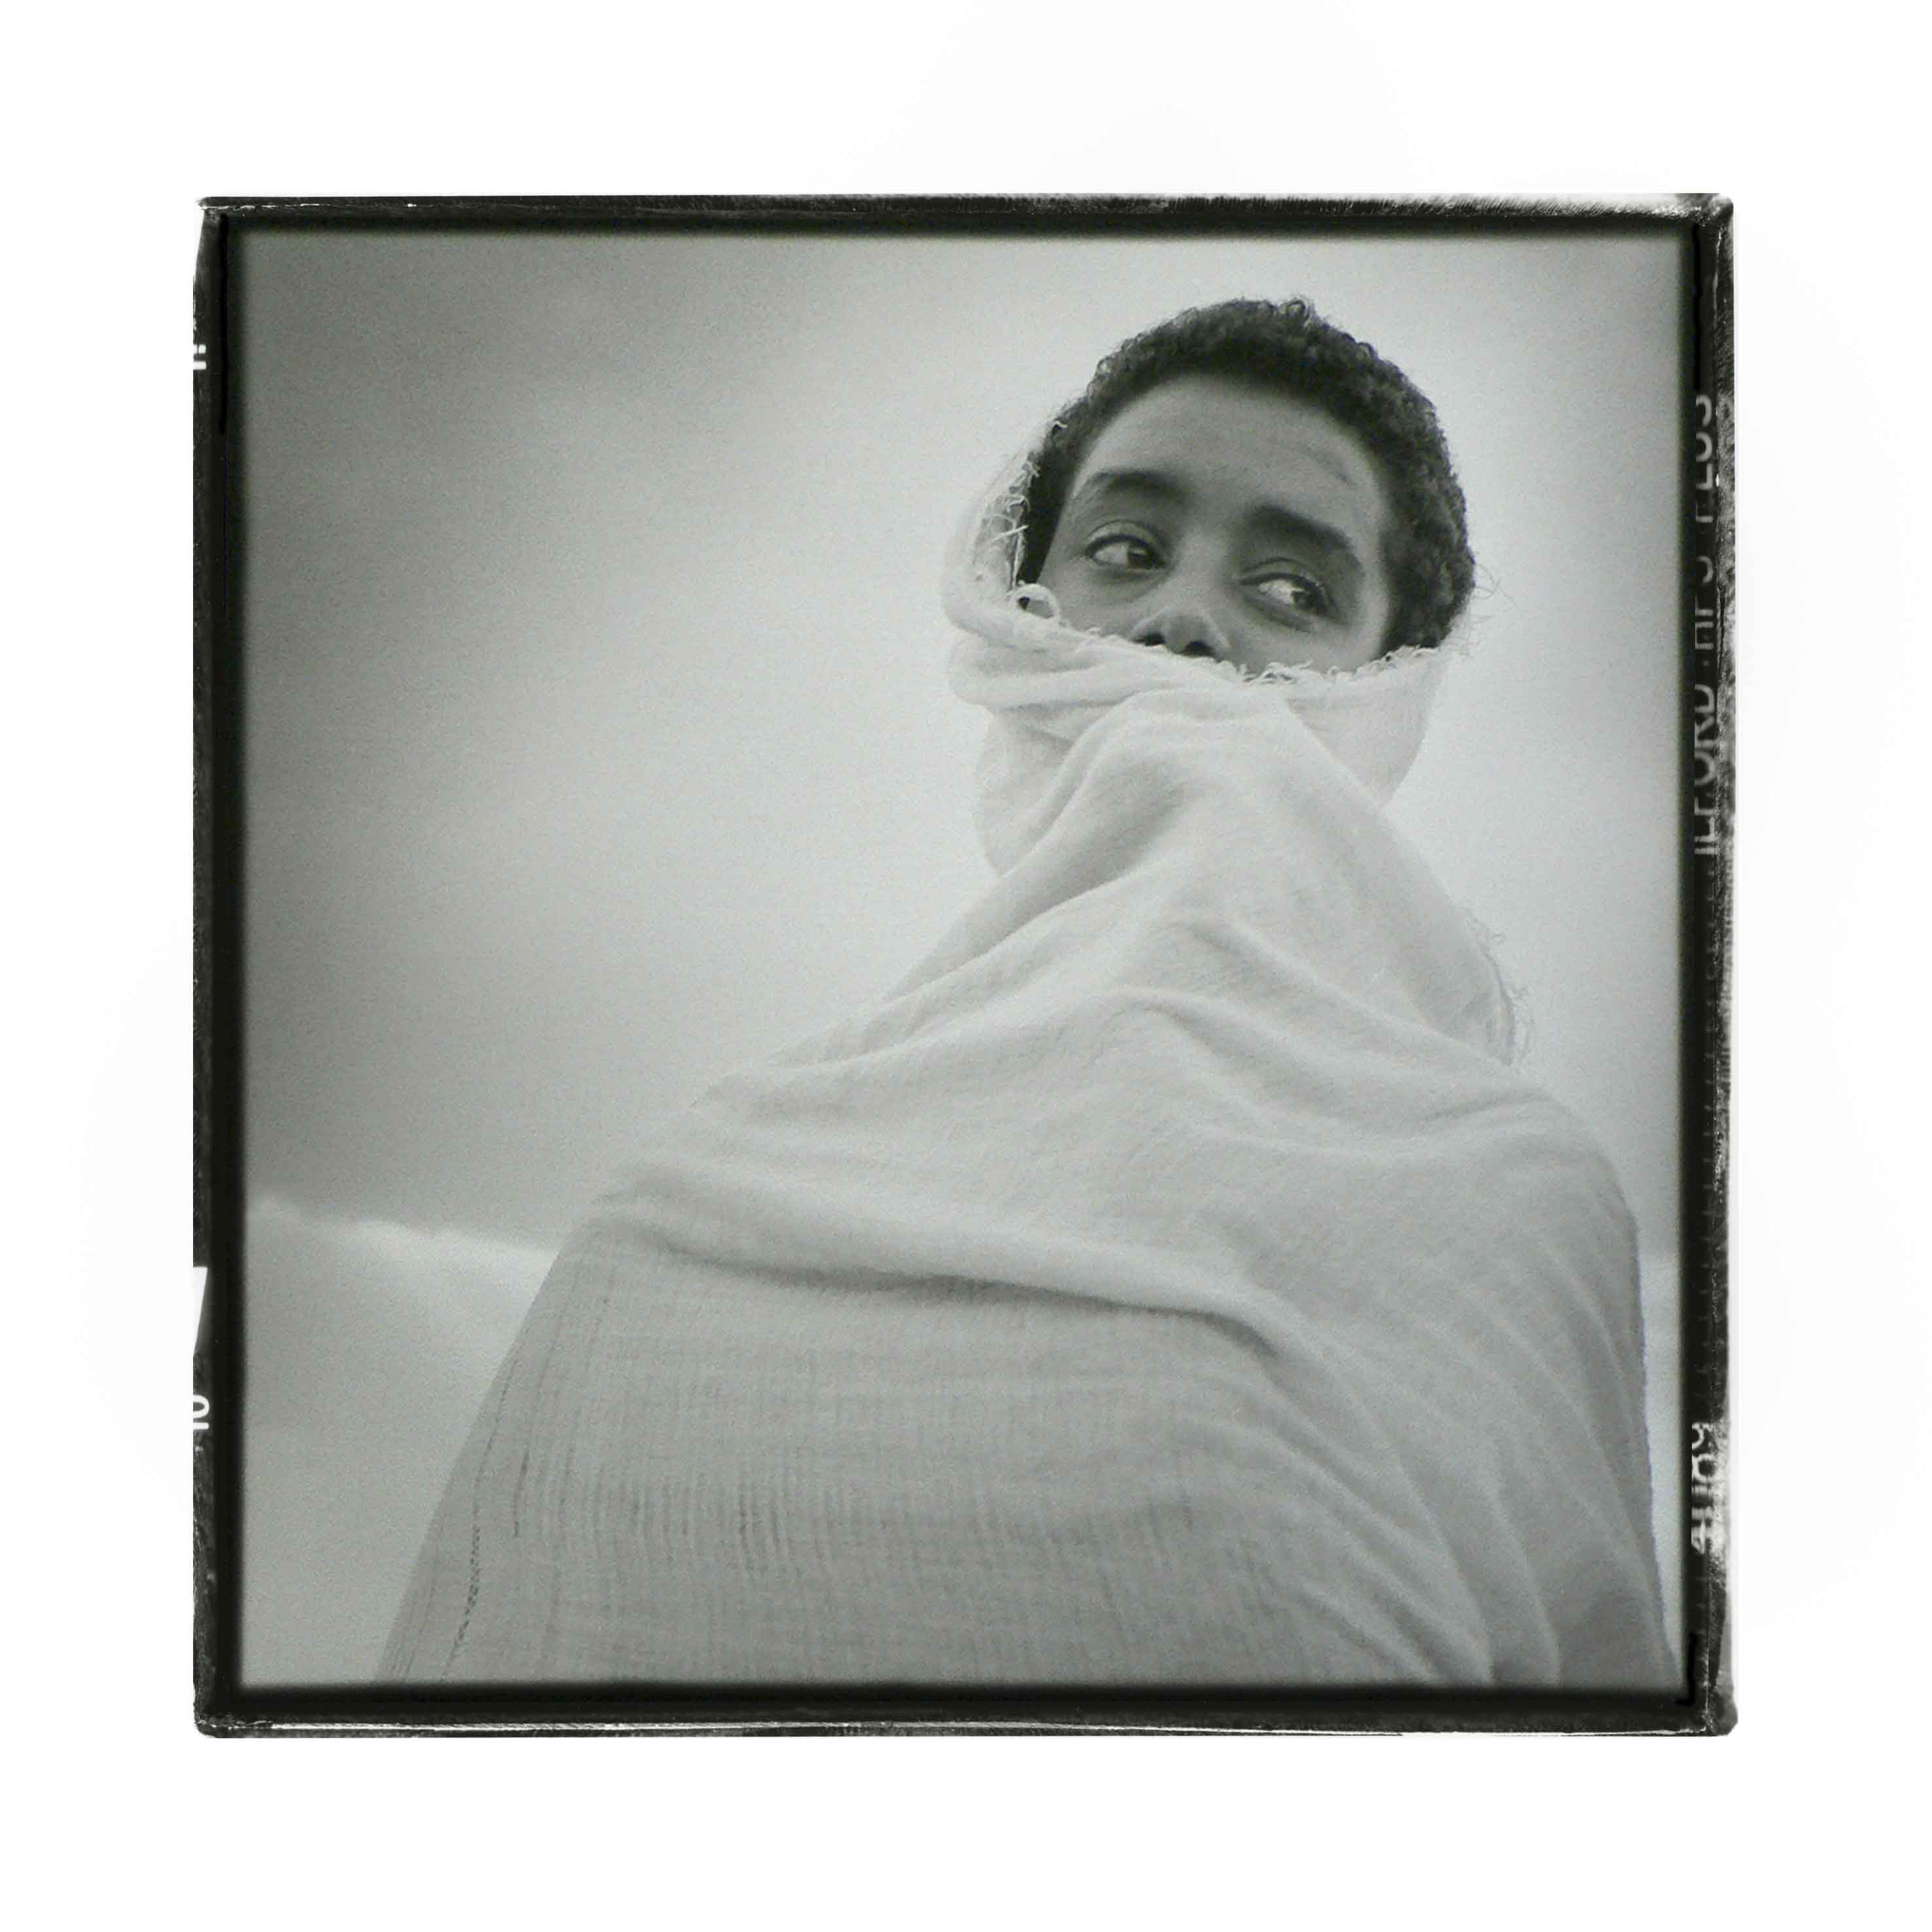 Etíope 19, 2012<br/>Gelatinoclorobromuro de plata / Silver gelatin print